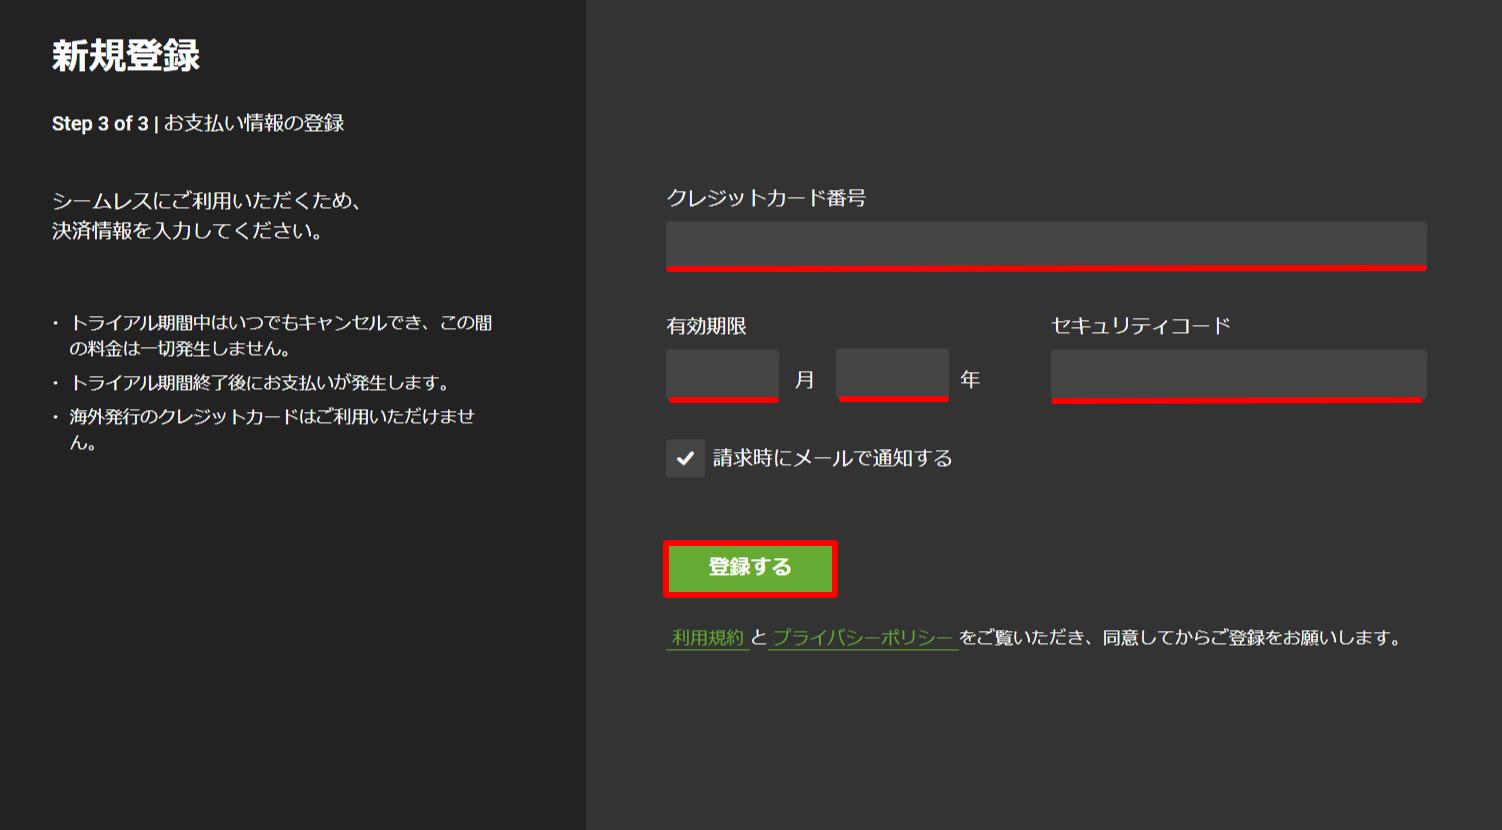 Hulu_LR_5.png